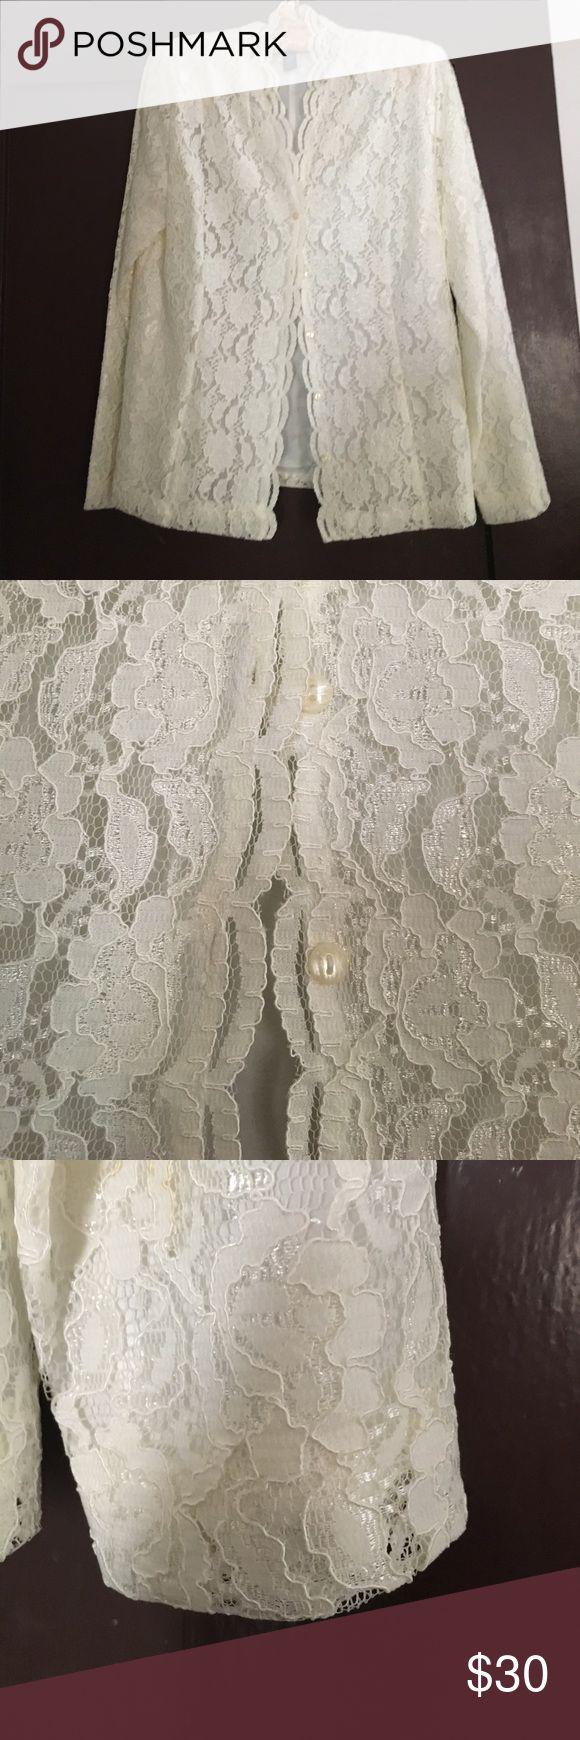 🚨Vintage Karen Scott Lace Blouse🚨 🚨Final Reduction🚨 Vintage retro Karen Scott Lace Blouse in mint condition! Karen Scott Tops Blouses